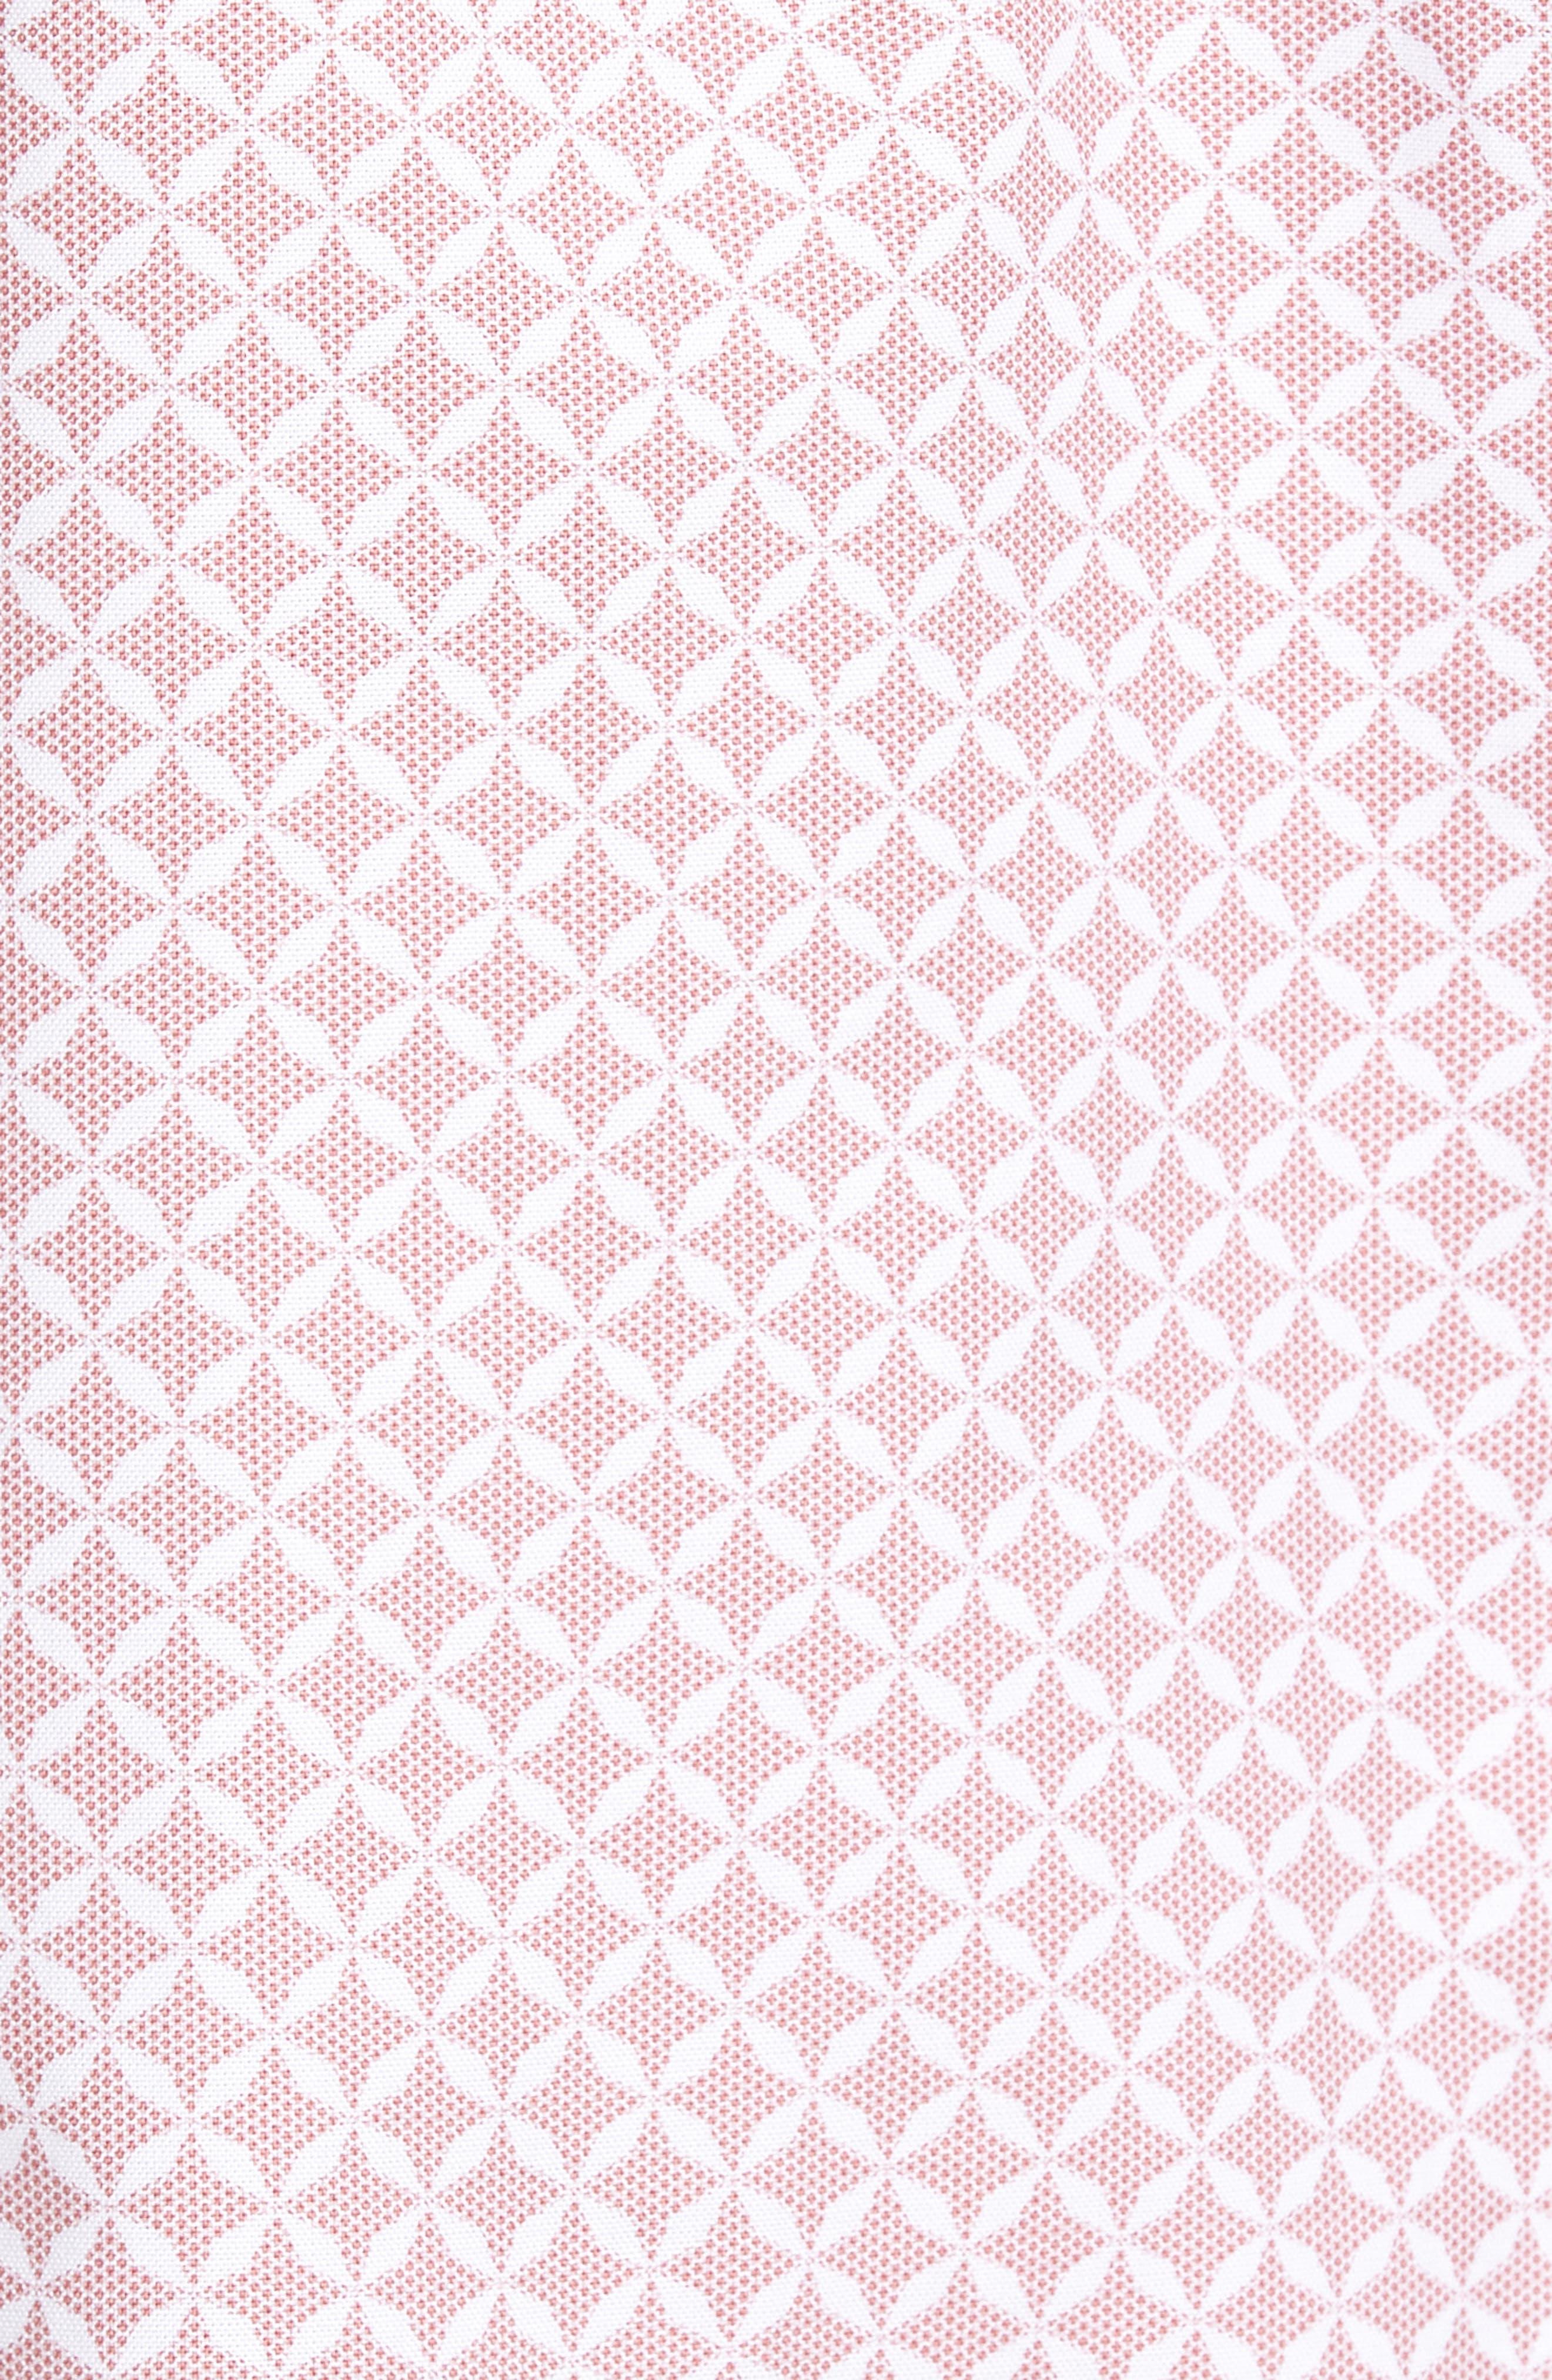 Langaz Dot Lattice Sport Shirt,                             Alternate thumbnail 6, color,                             Pink